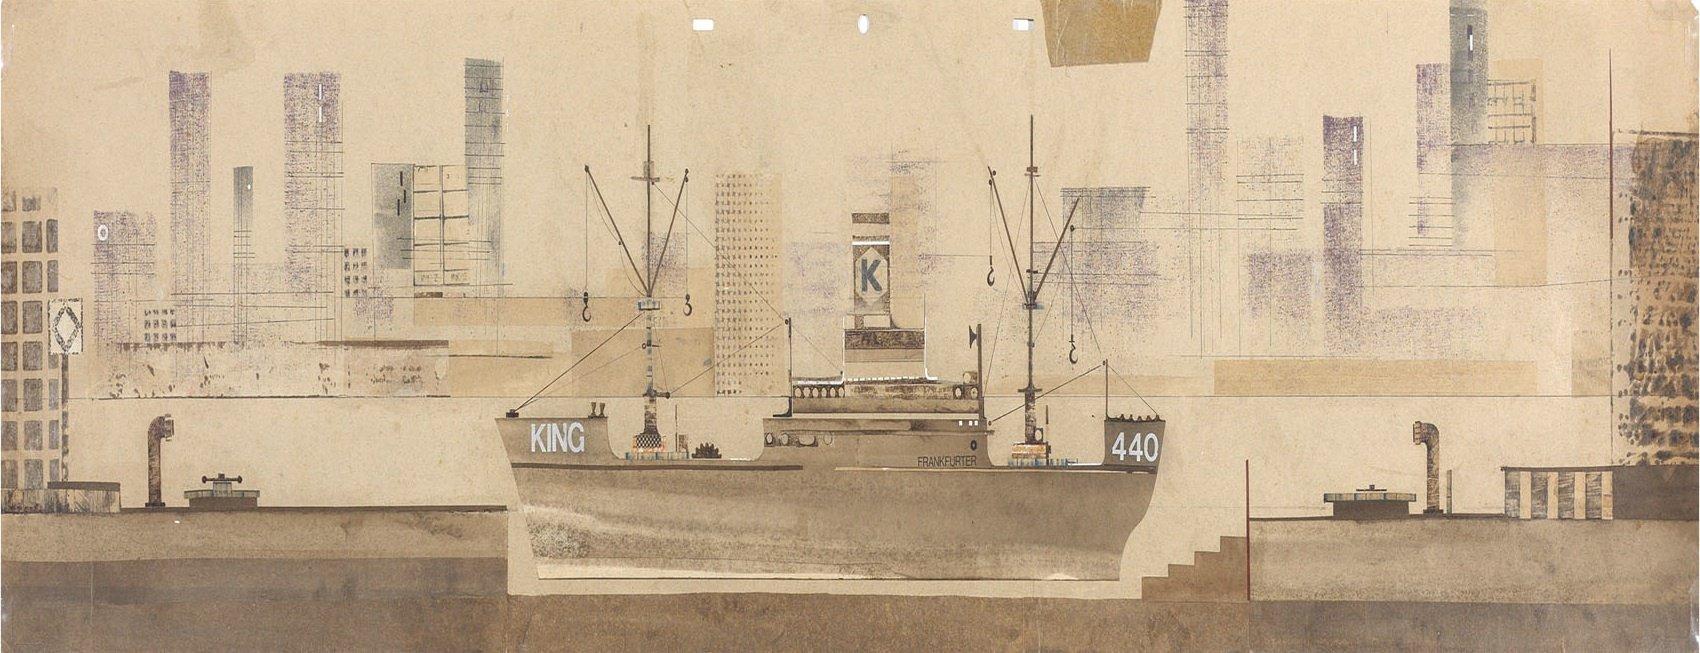 Pascali, Scenografia Porto King 440, 1958, 24x99,5 cm